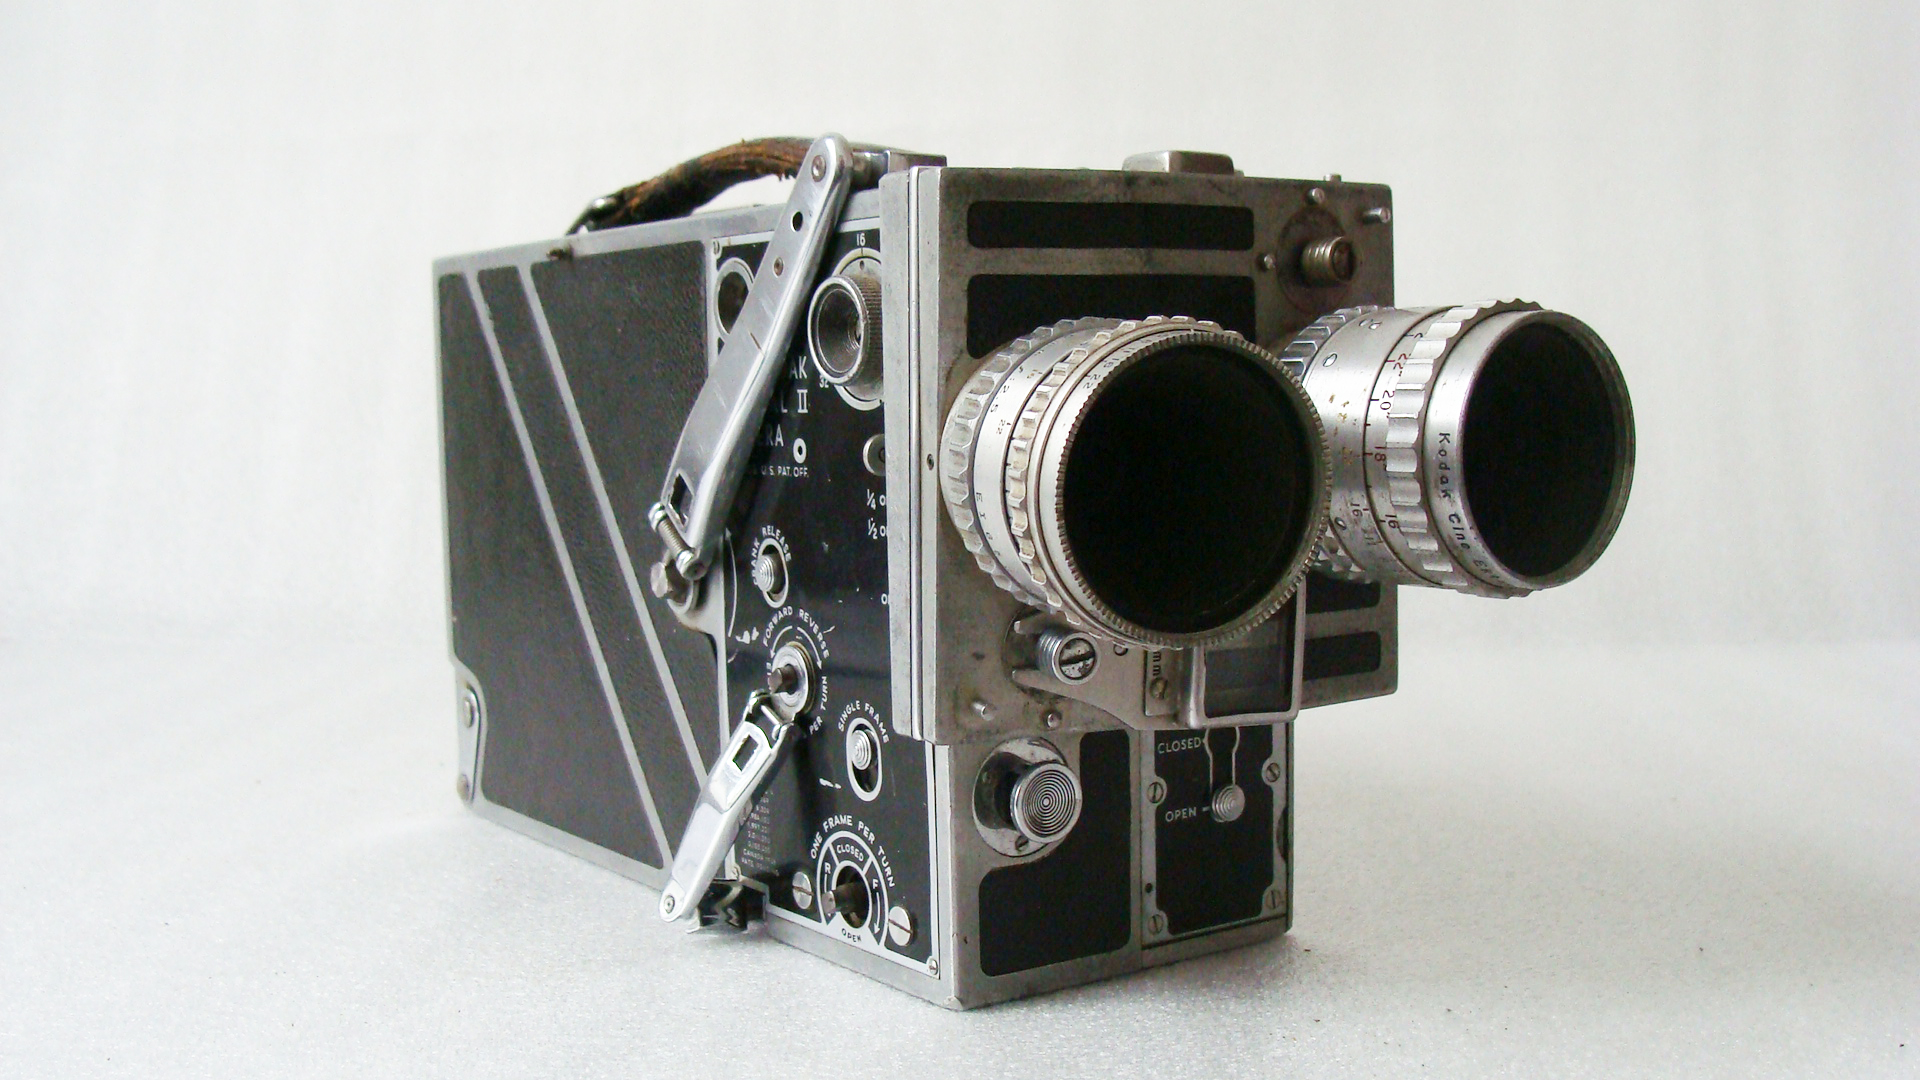 Kino kamera CINÉ- KODAK SPECIAL II CAMERA